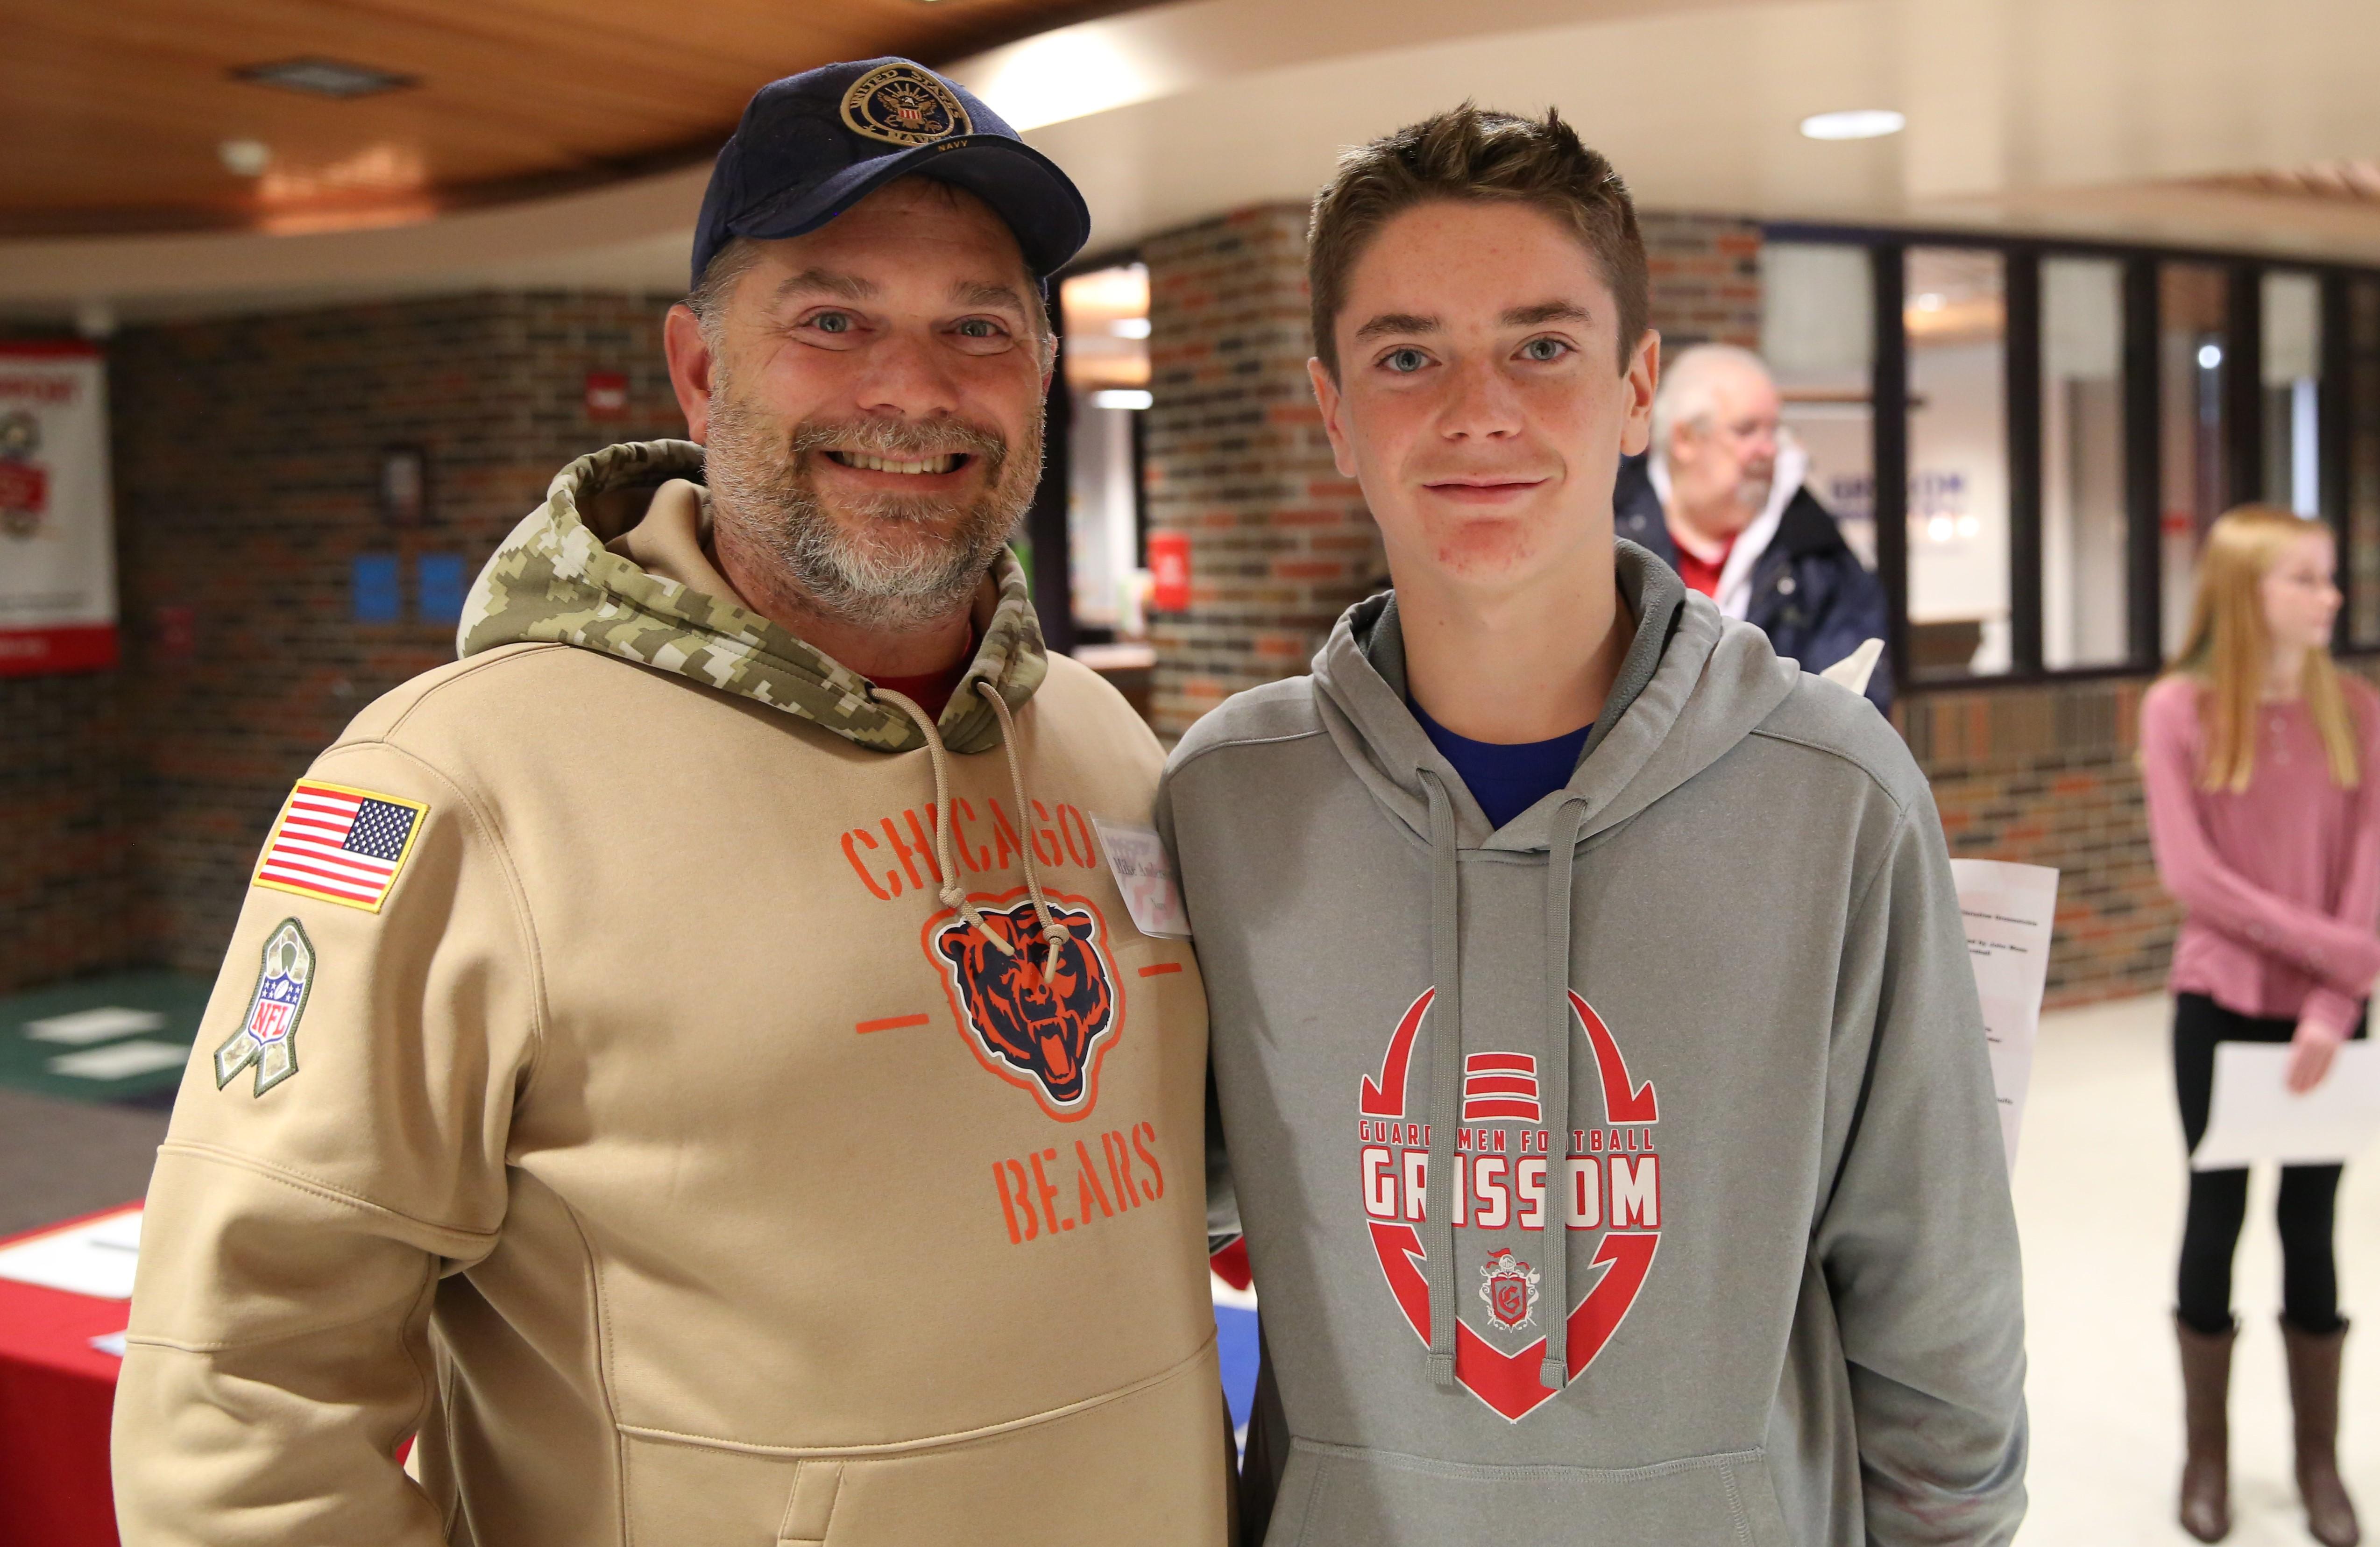 Grissom student with veteran family member